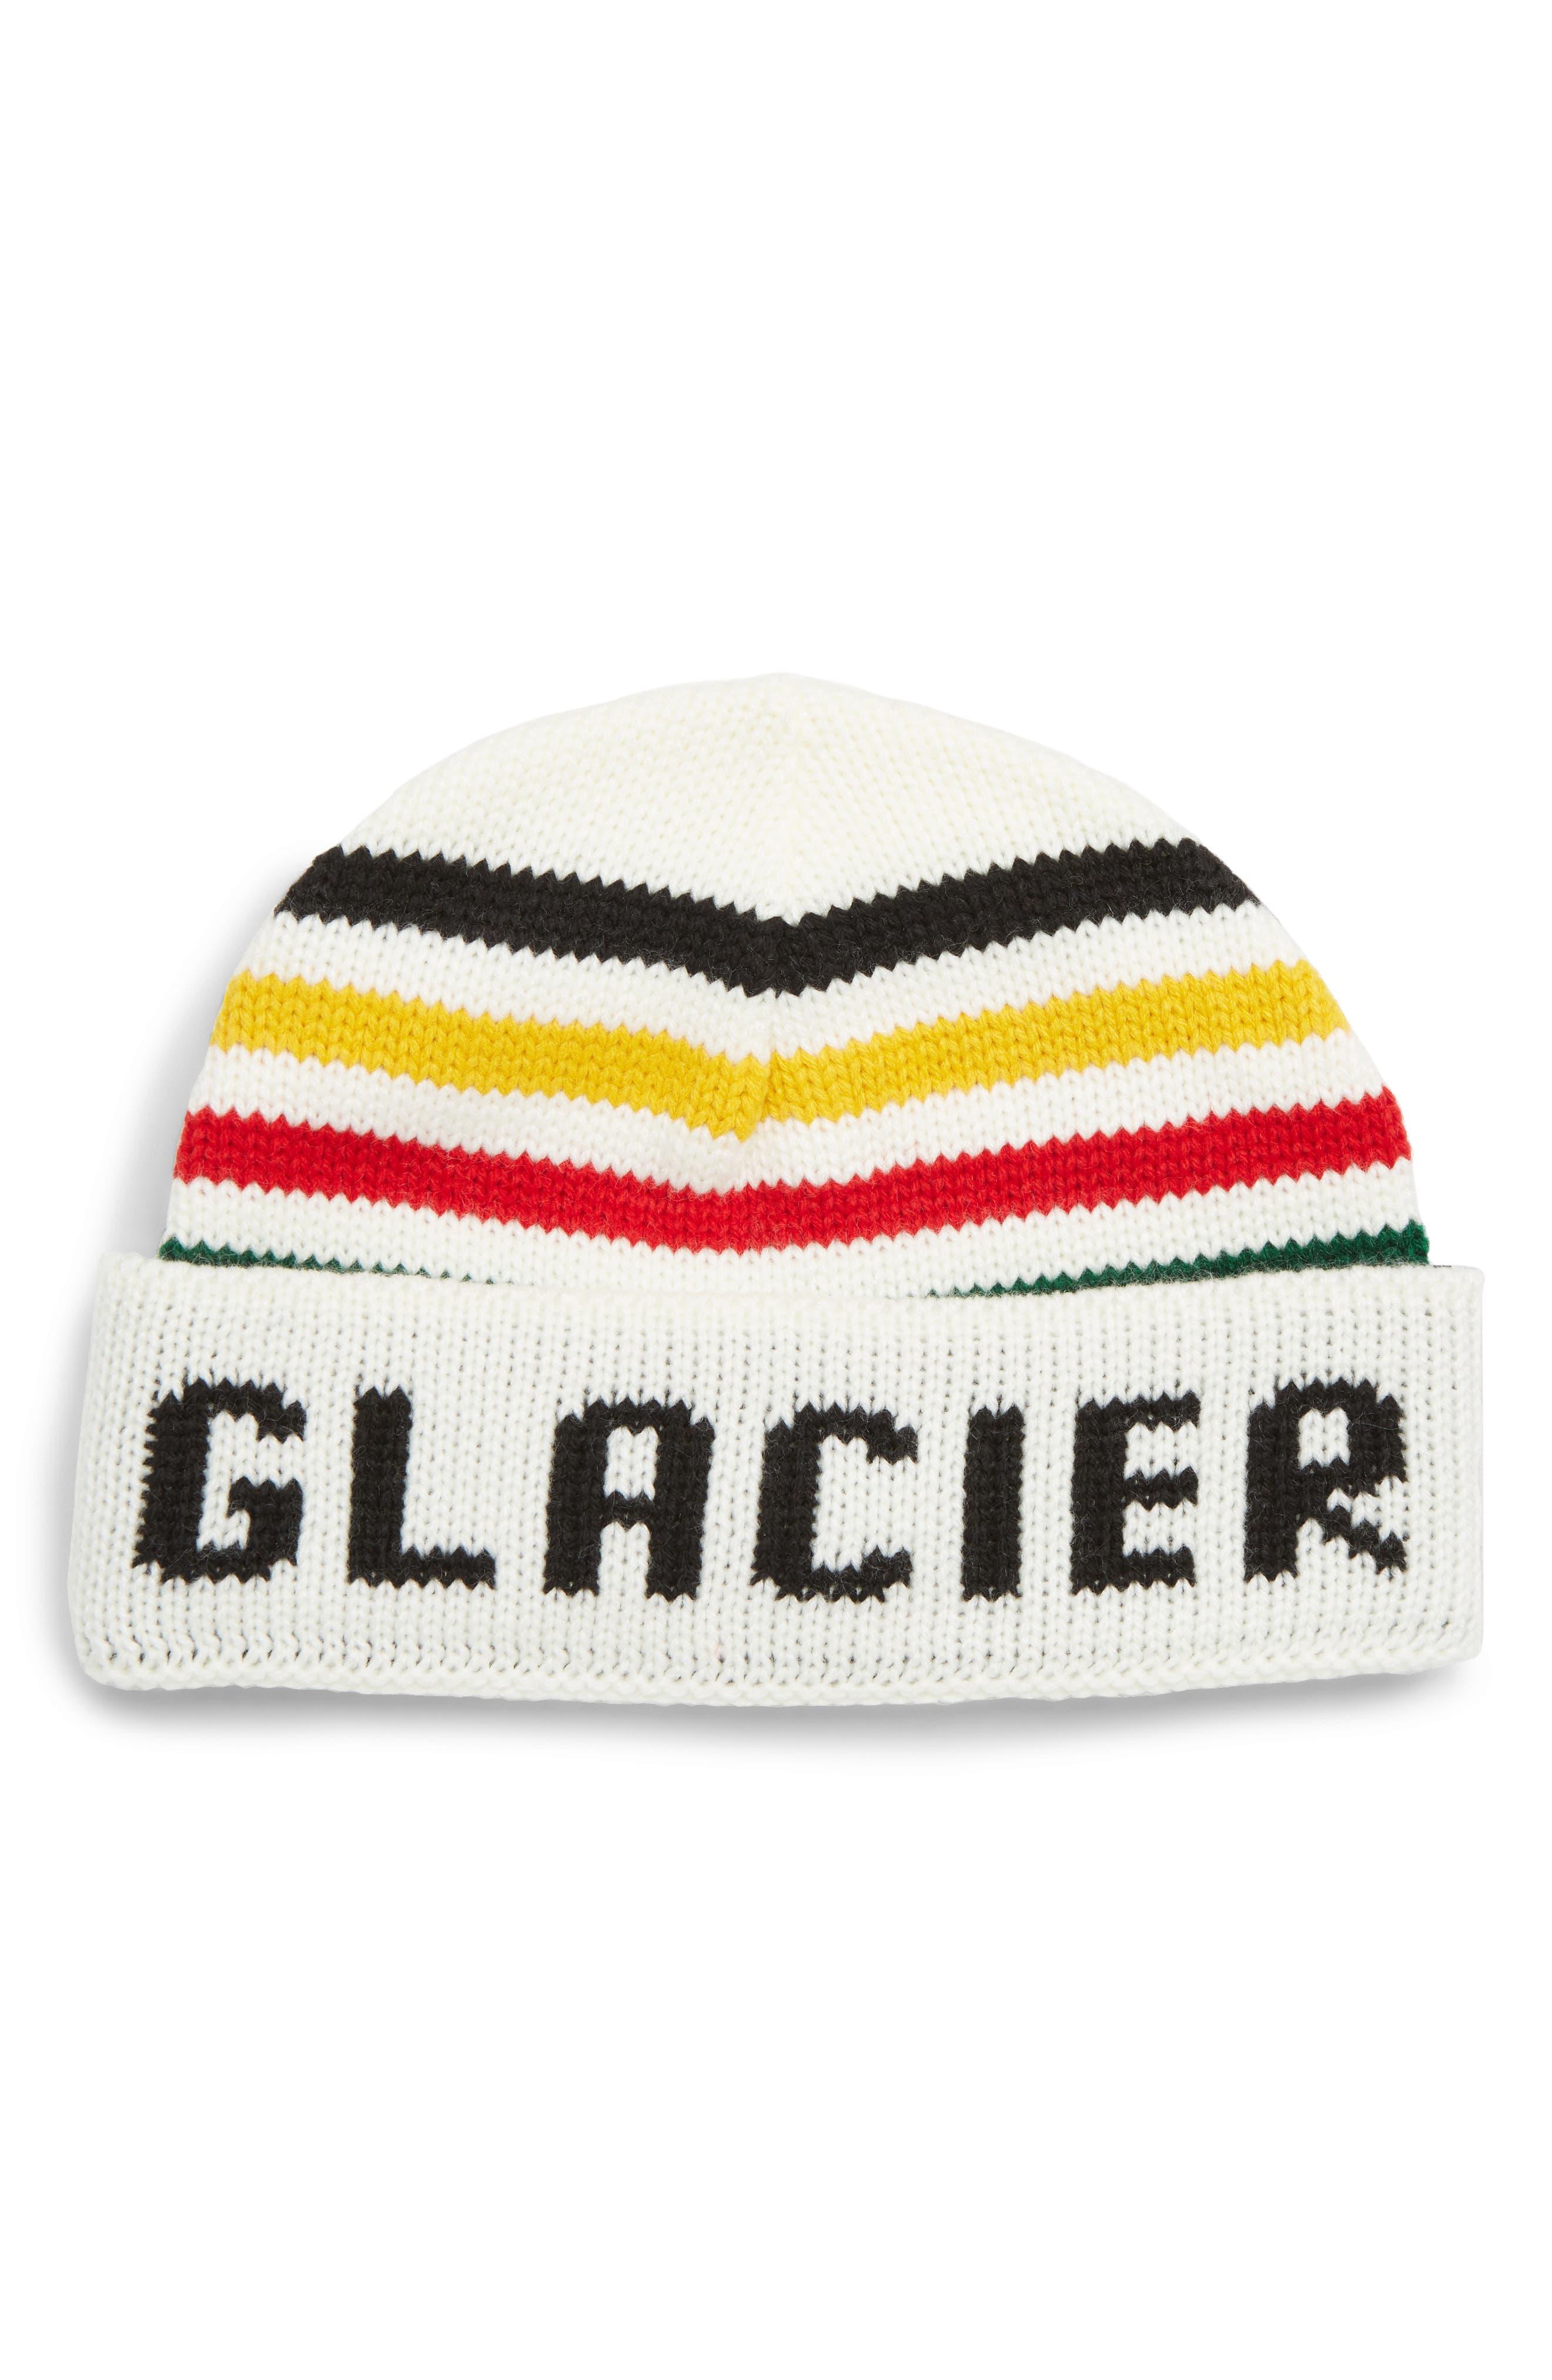 PENDLETON National Park Script Beanie - White in Glacier Stripe